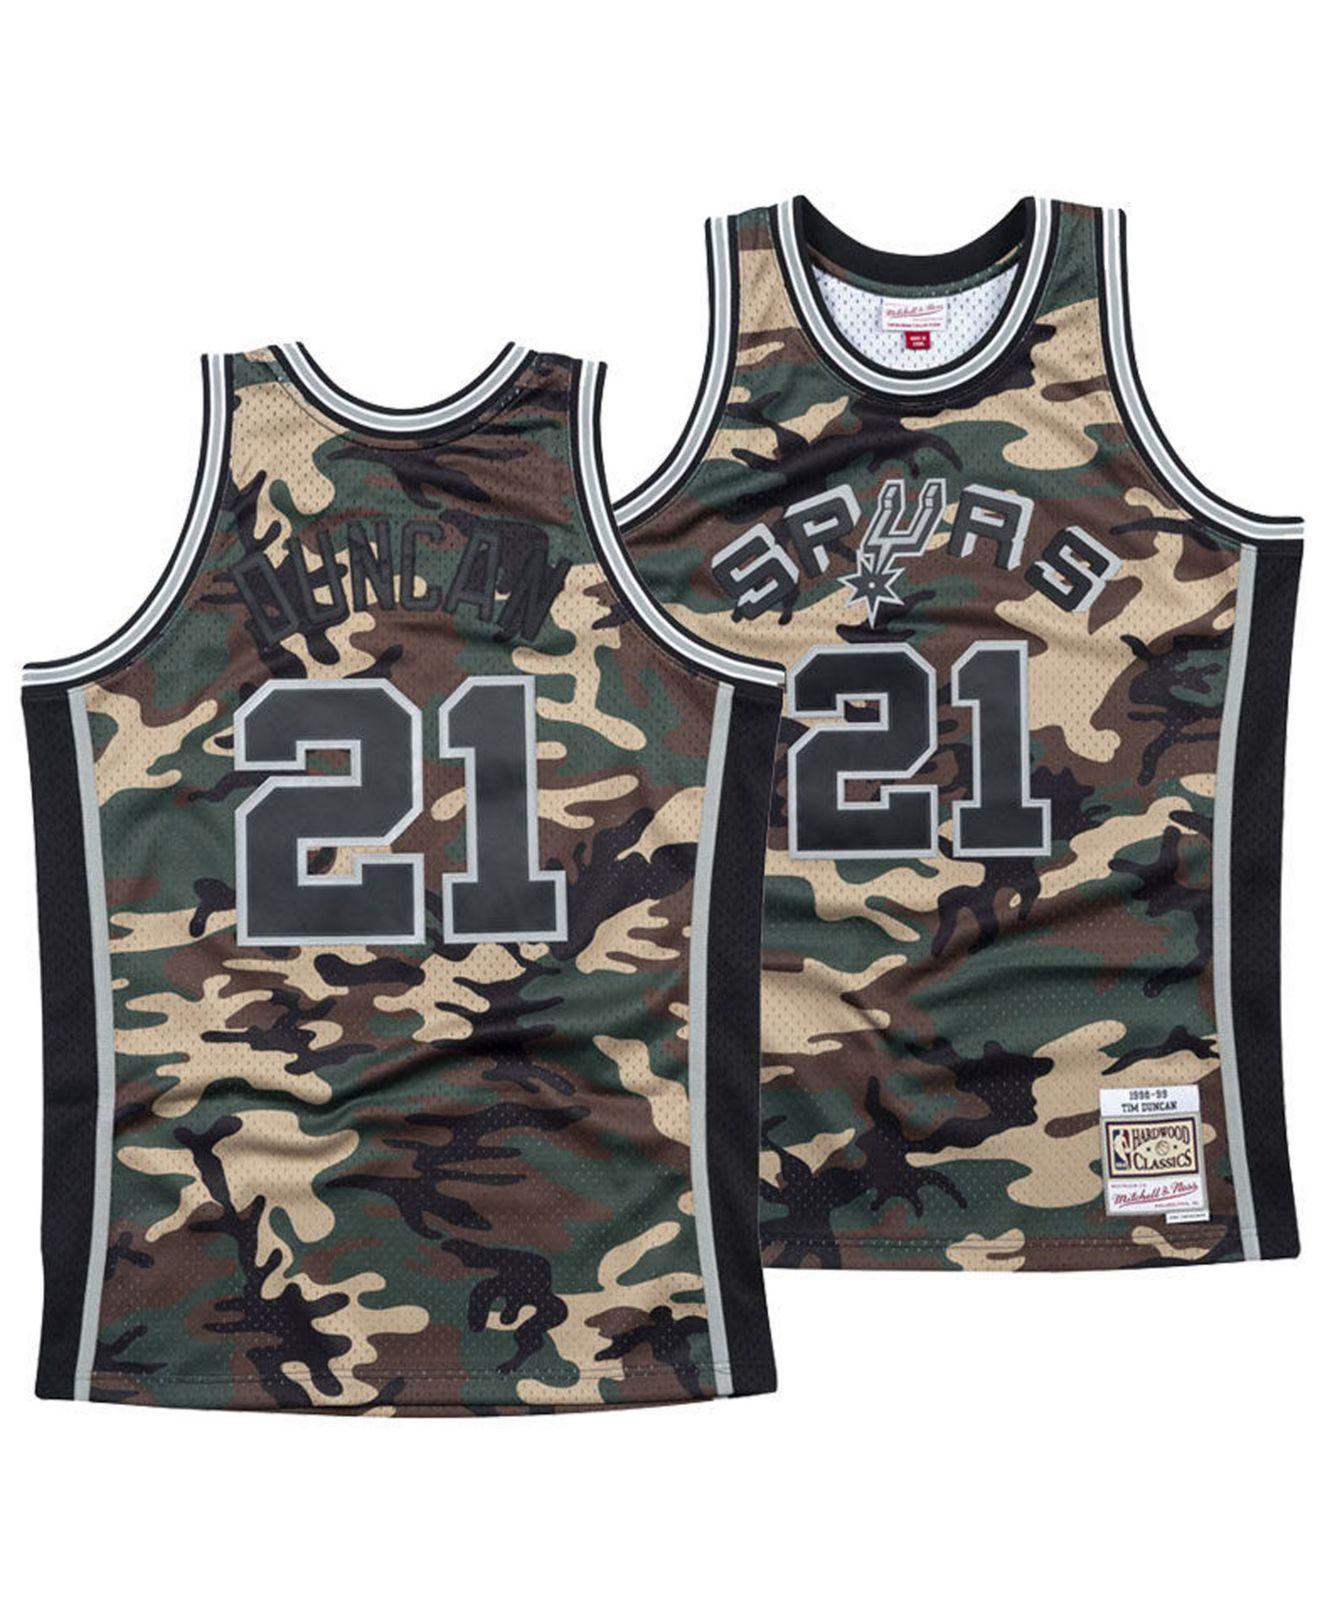 competitive price 17a29 a3753 Men's Black Tim Duncan San Antonio Spurs Woodland Camo Swingman Jersey